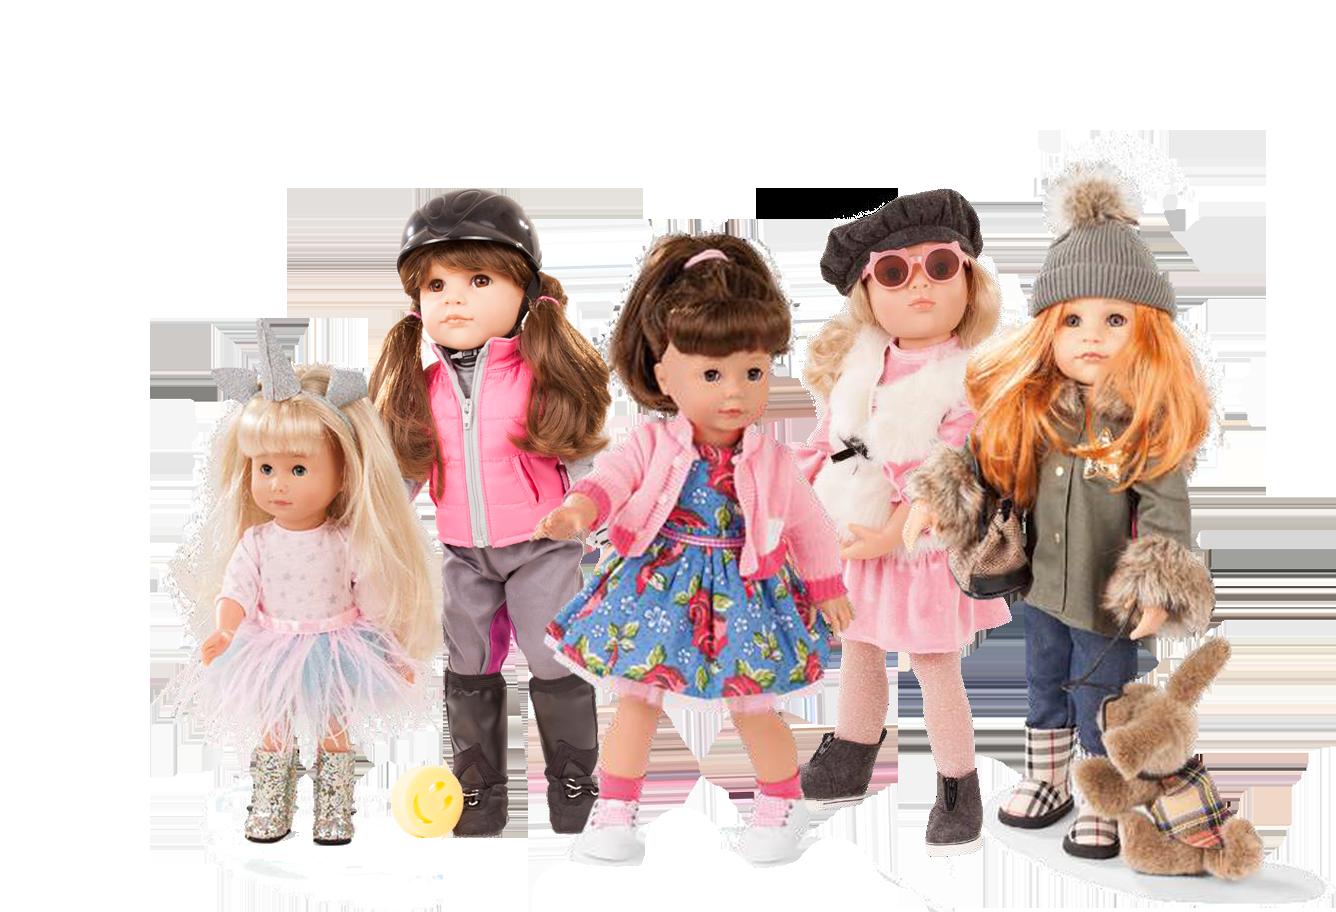 White/Caucasian Dolls